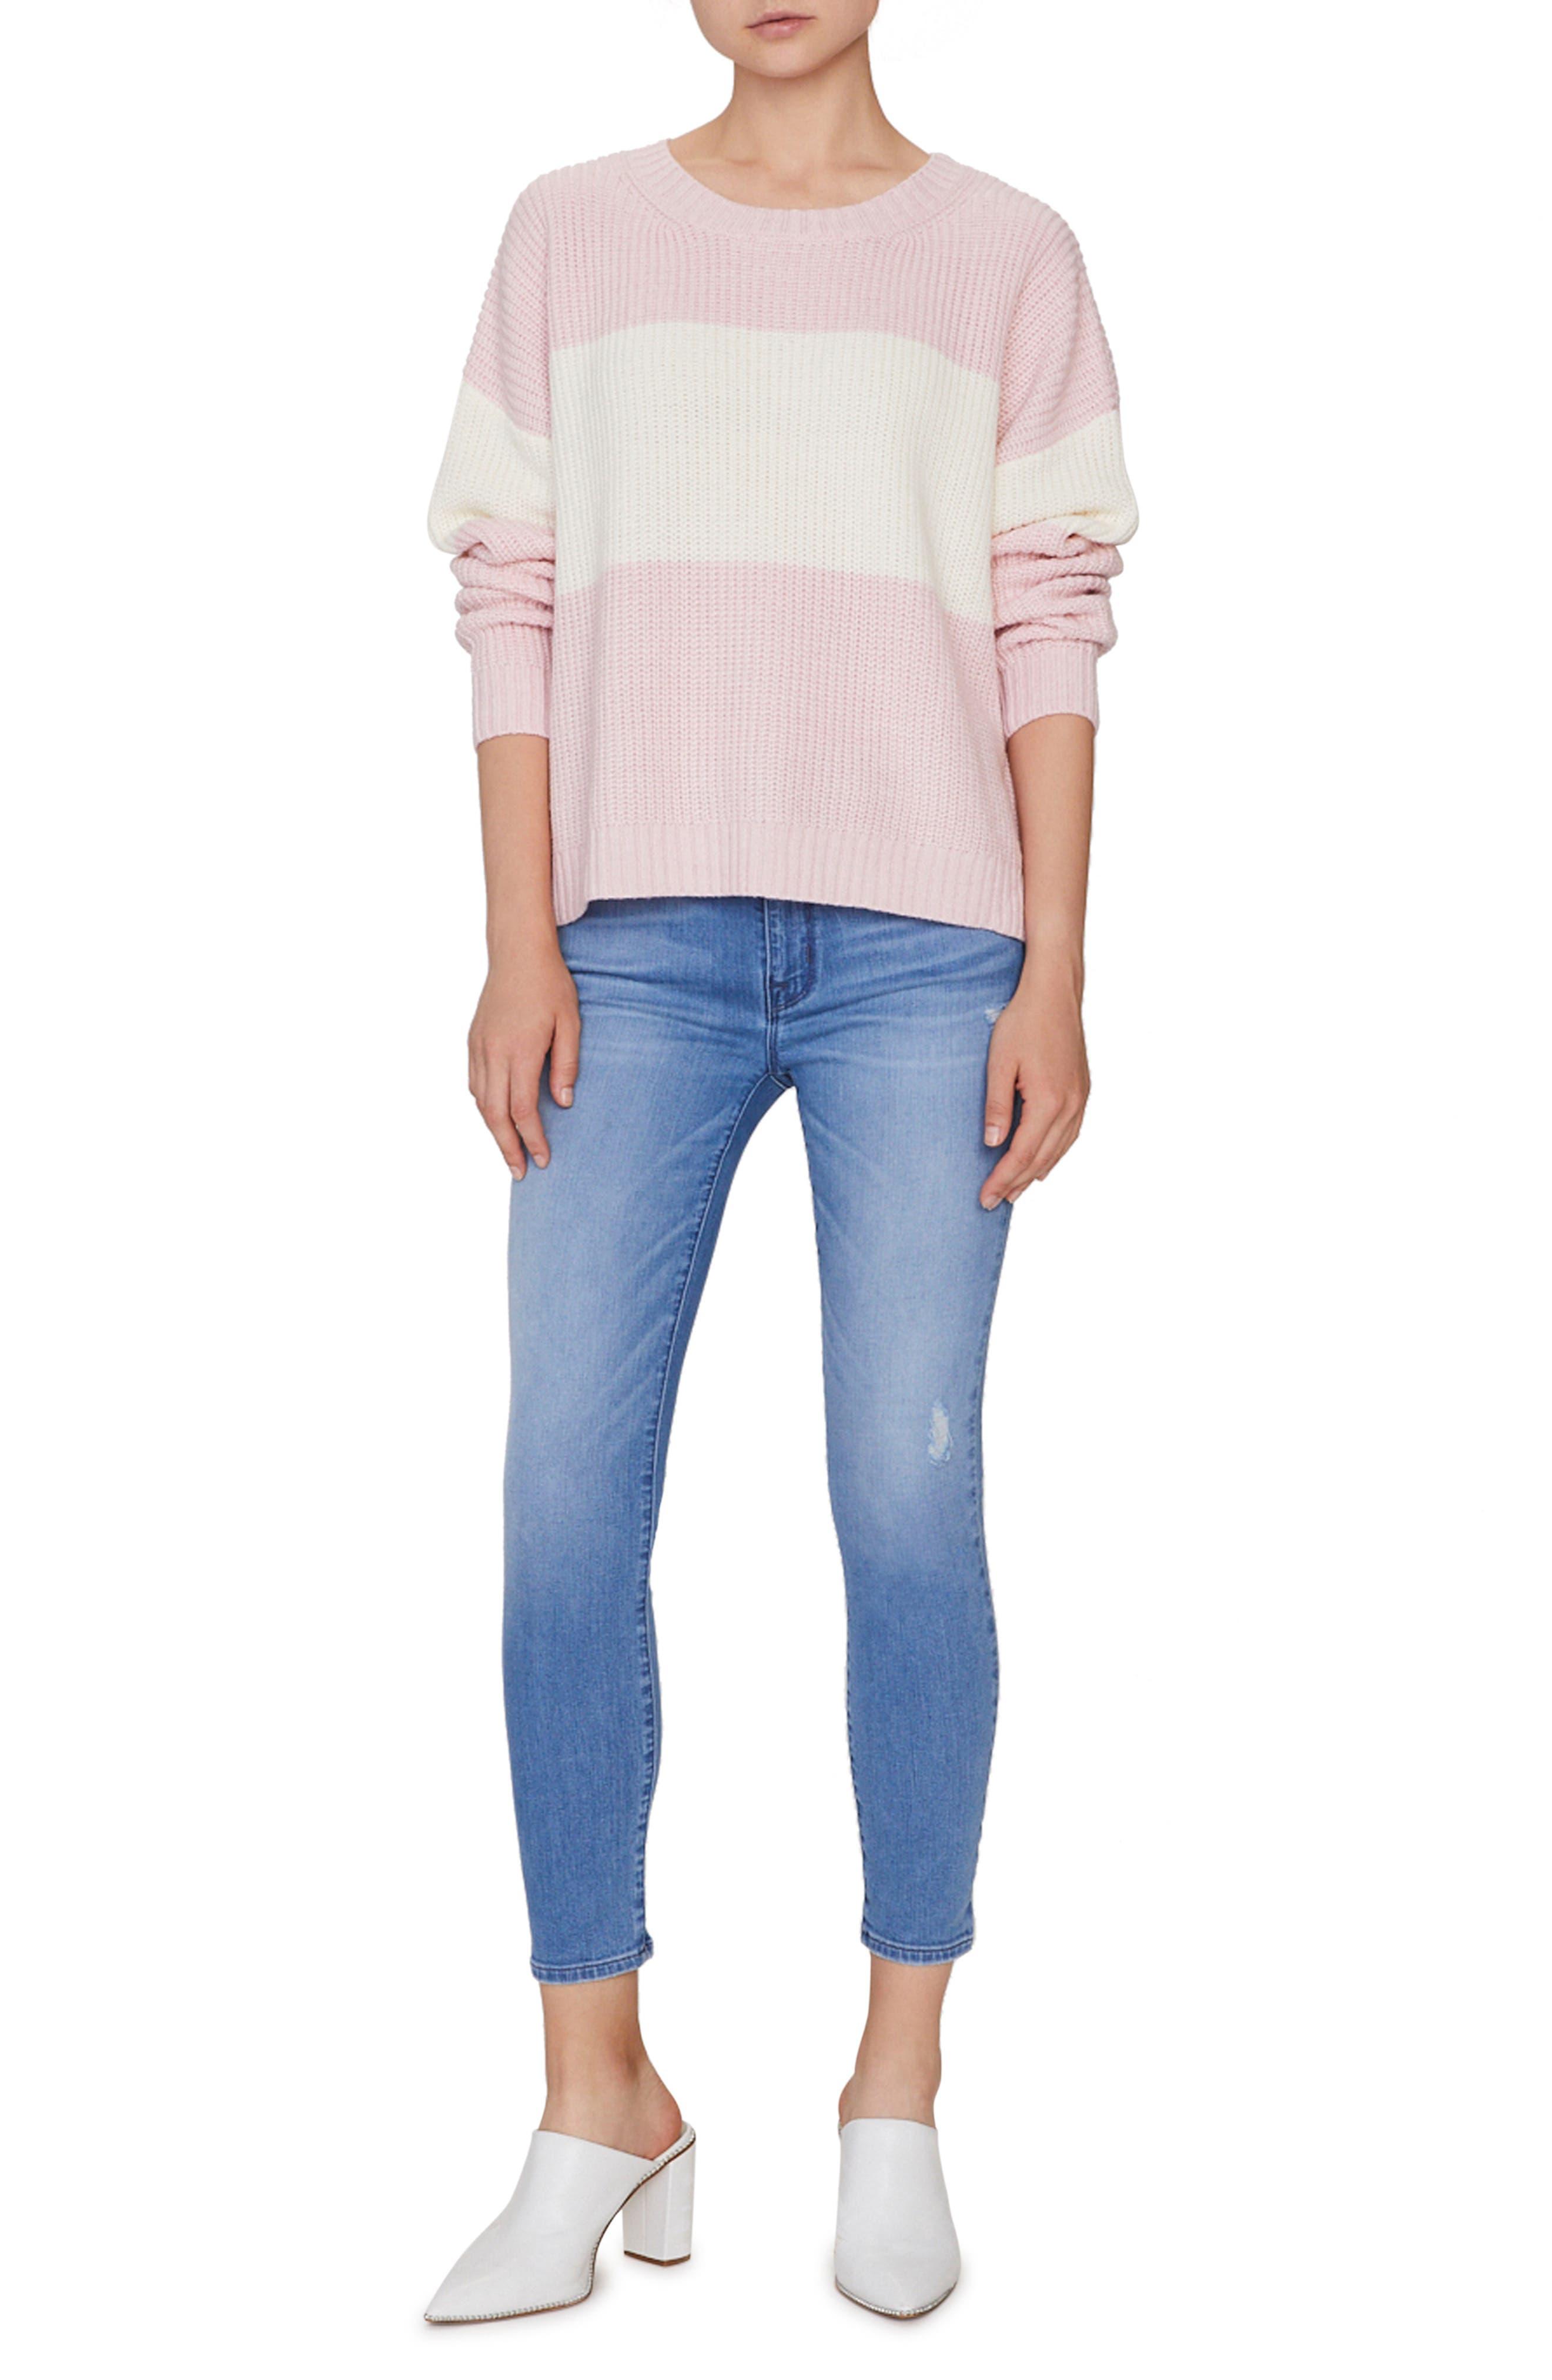 SANCTUARY,                             Billie Colorblock Shaker Sweater,                             Alternate thumbnail 5, color,                             HEATHER CHERRYBLOSSOM/ NATURAL